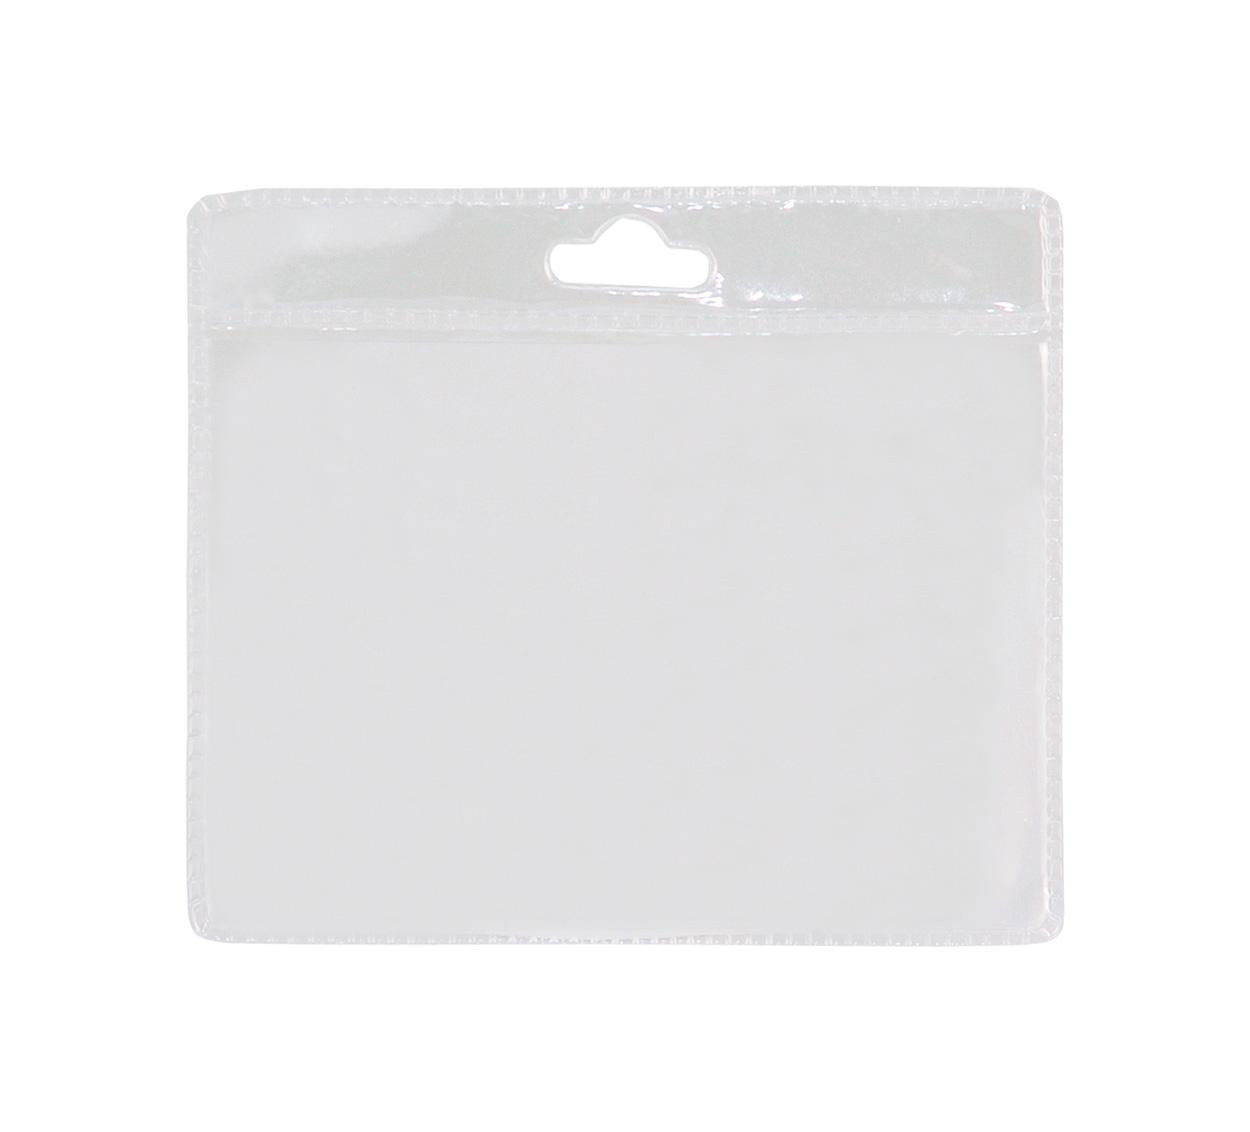 Ifem badge holder